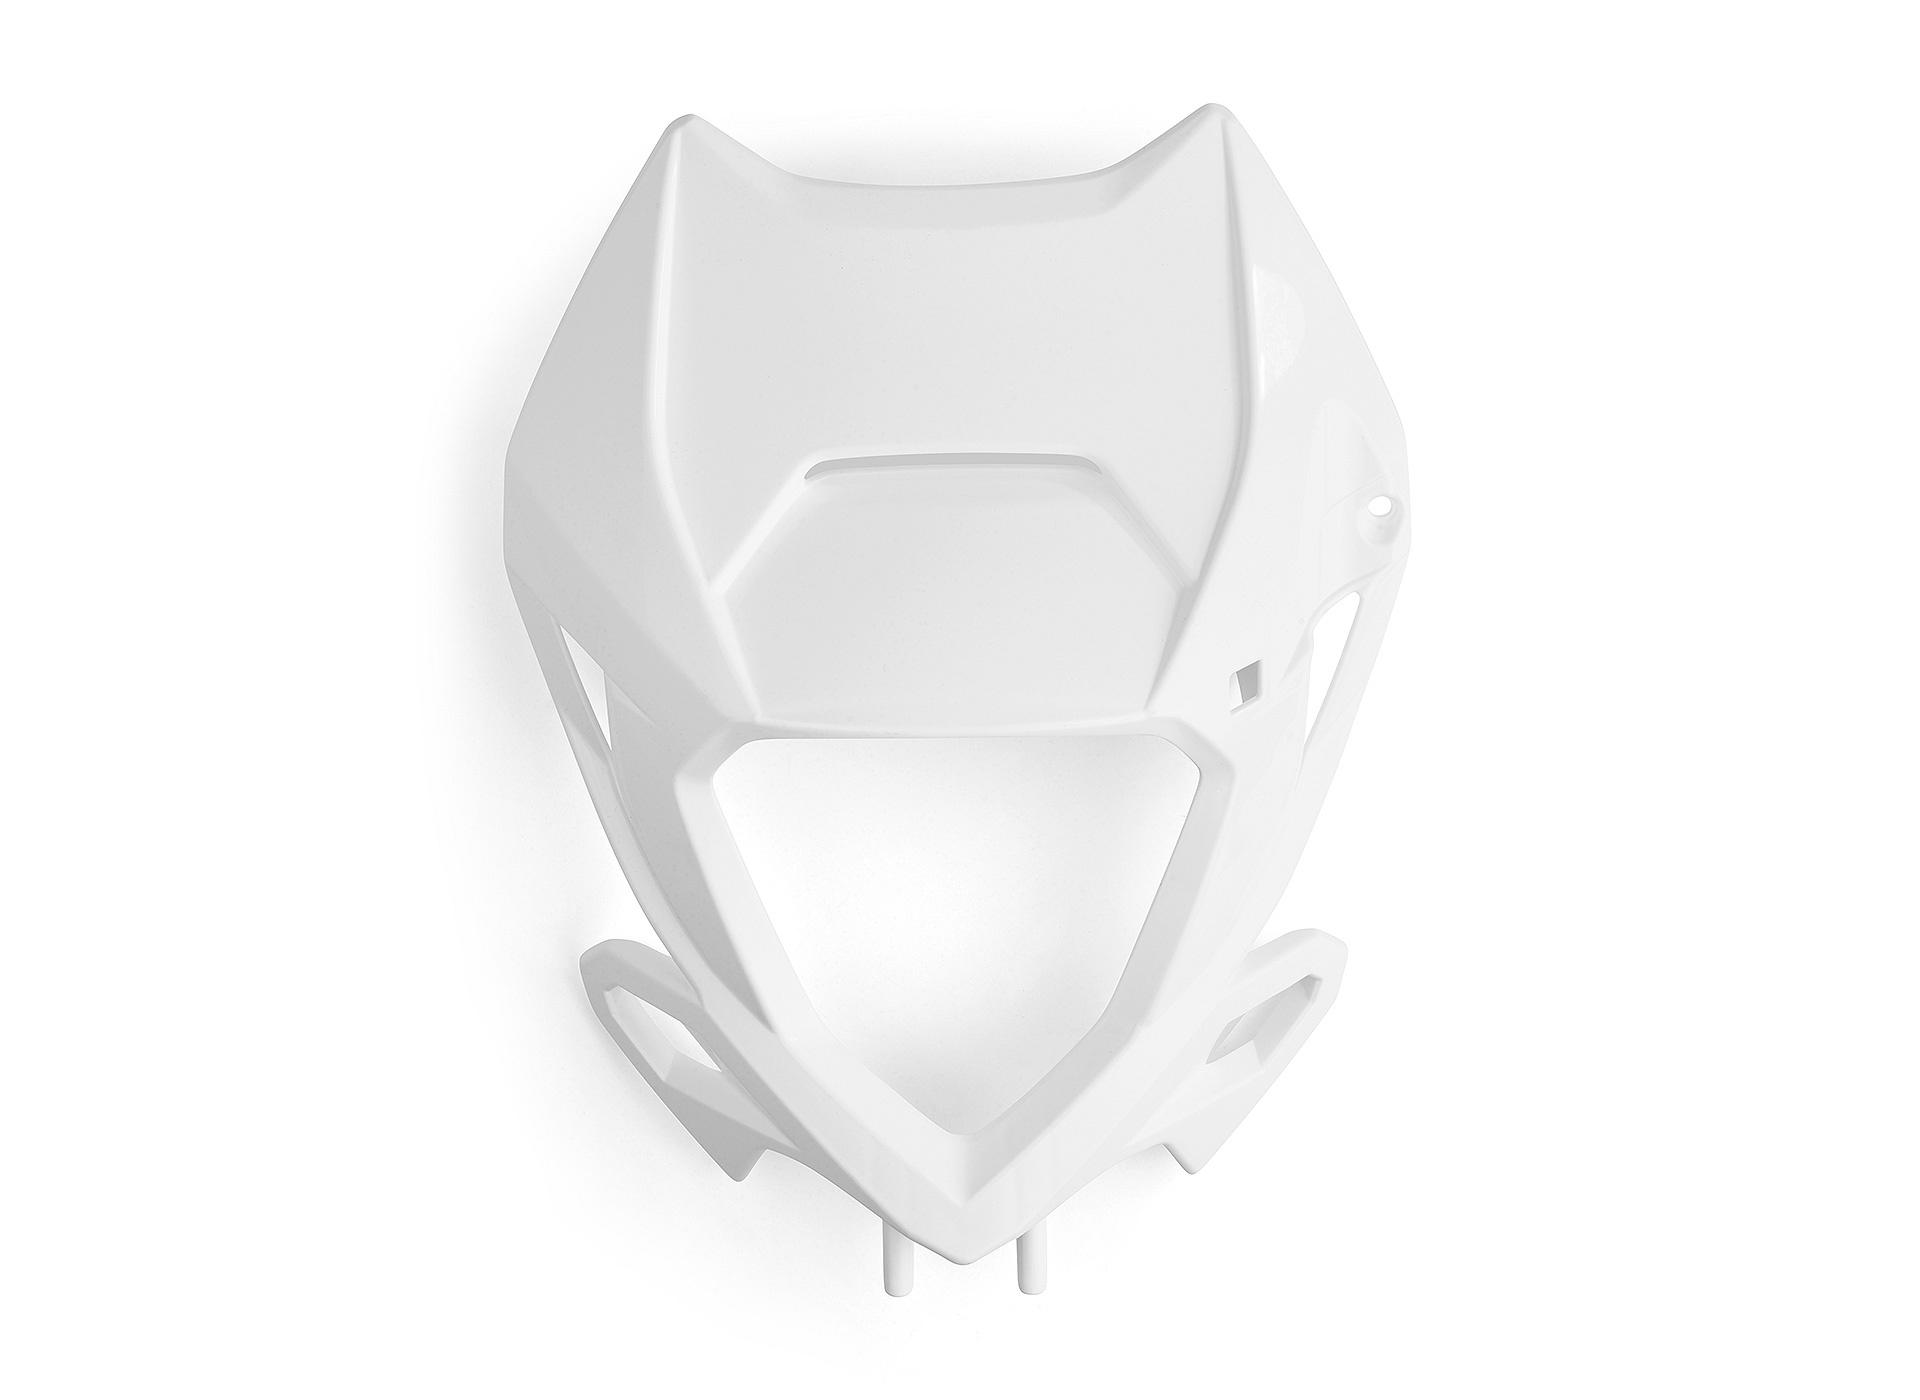 Beta Light Mask